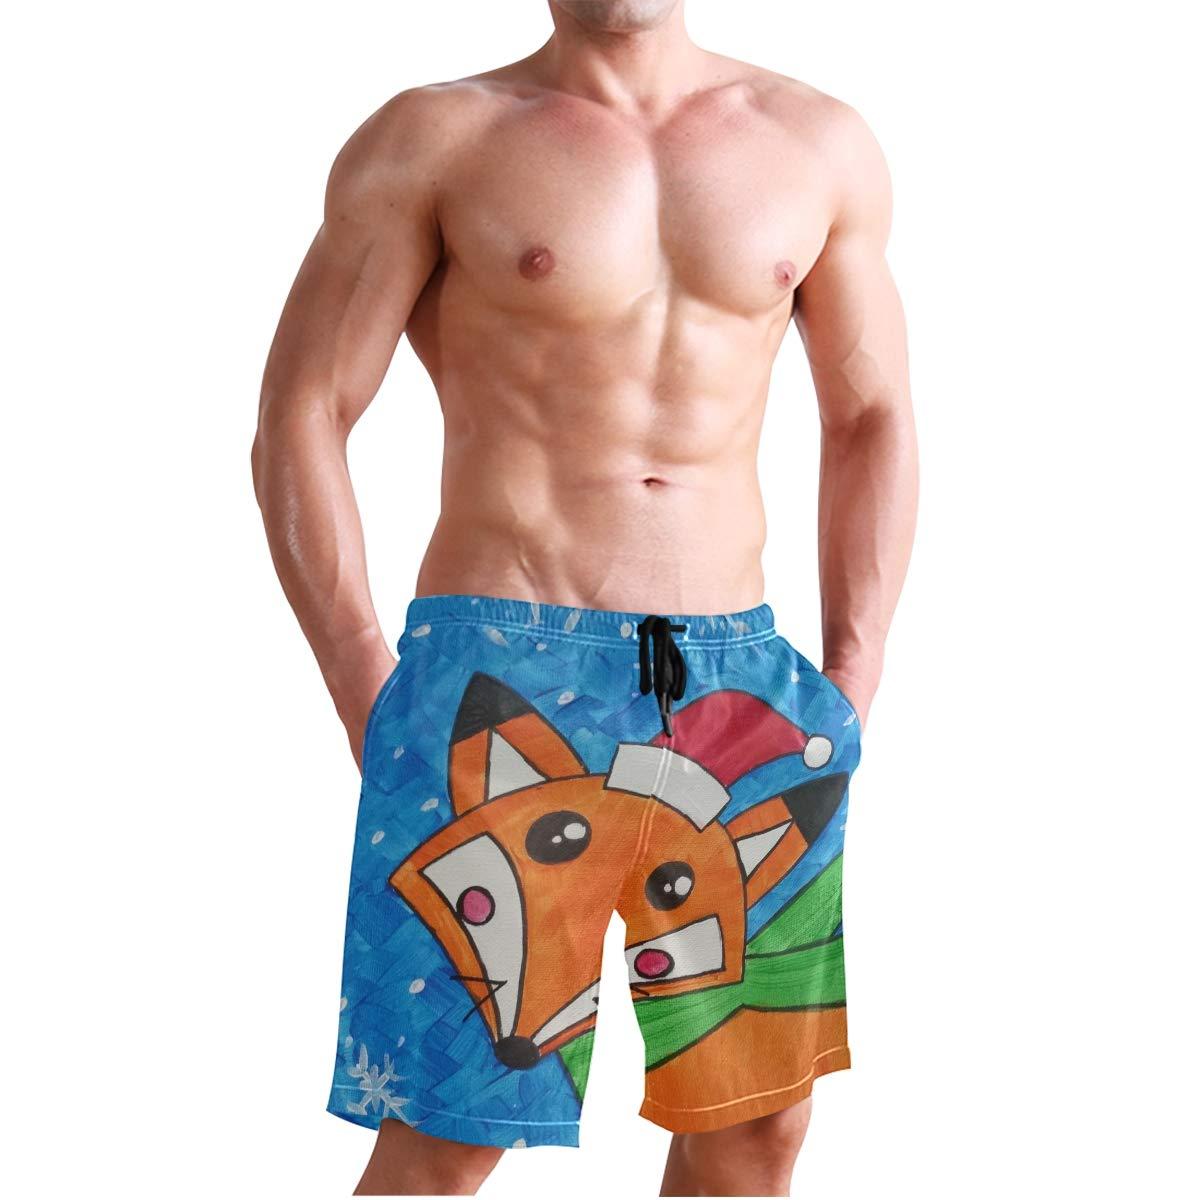 DEYYA Mens Fox Art Summer Beach Shorts Pants Swim Trunks Board Short for Men